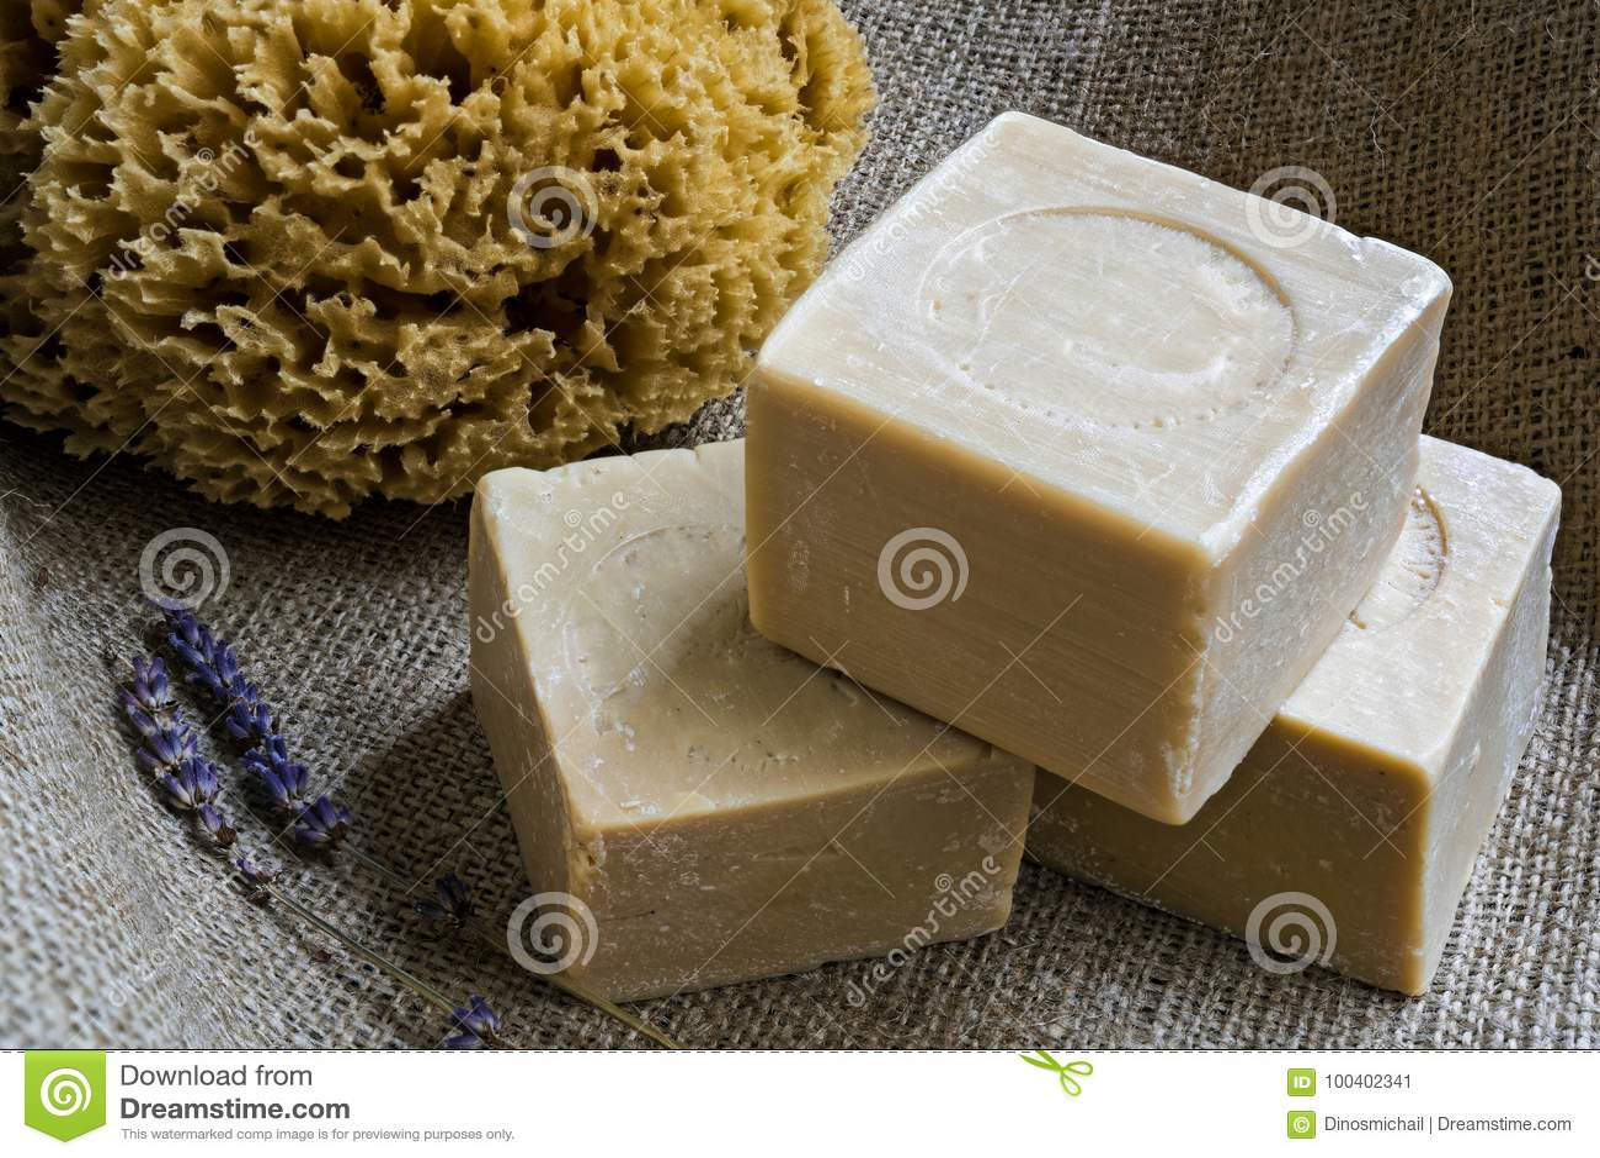 Мыла оливкового масла